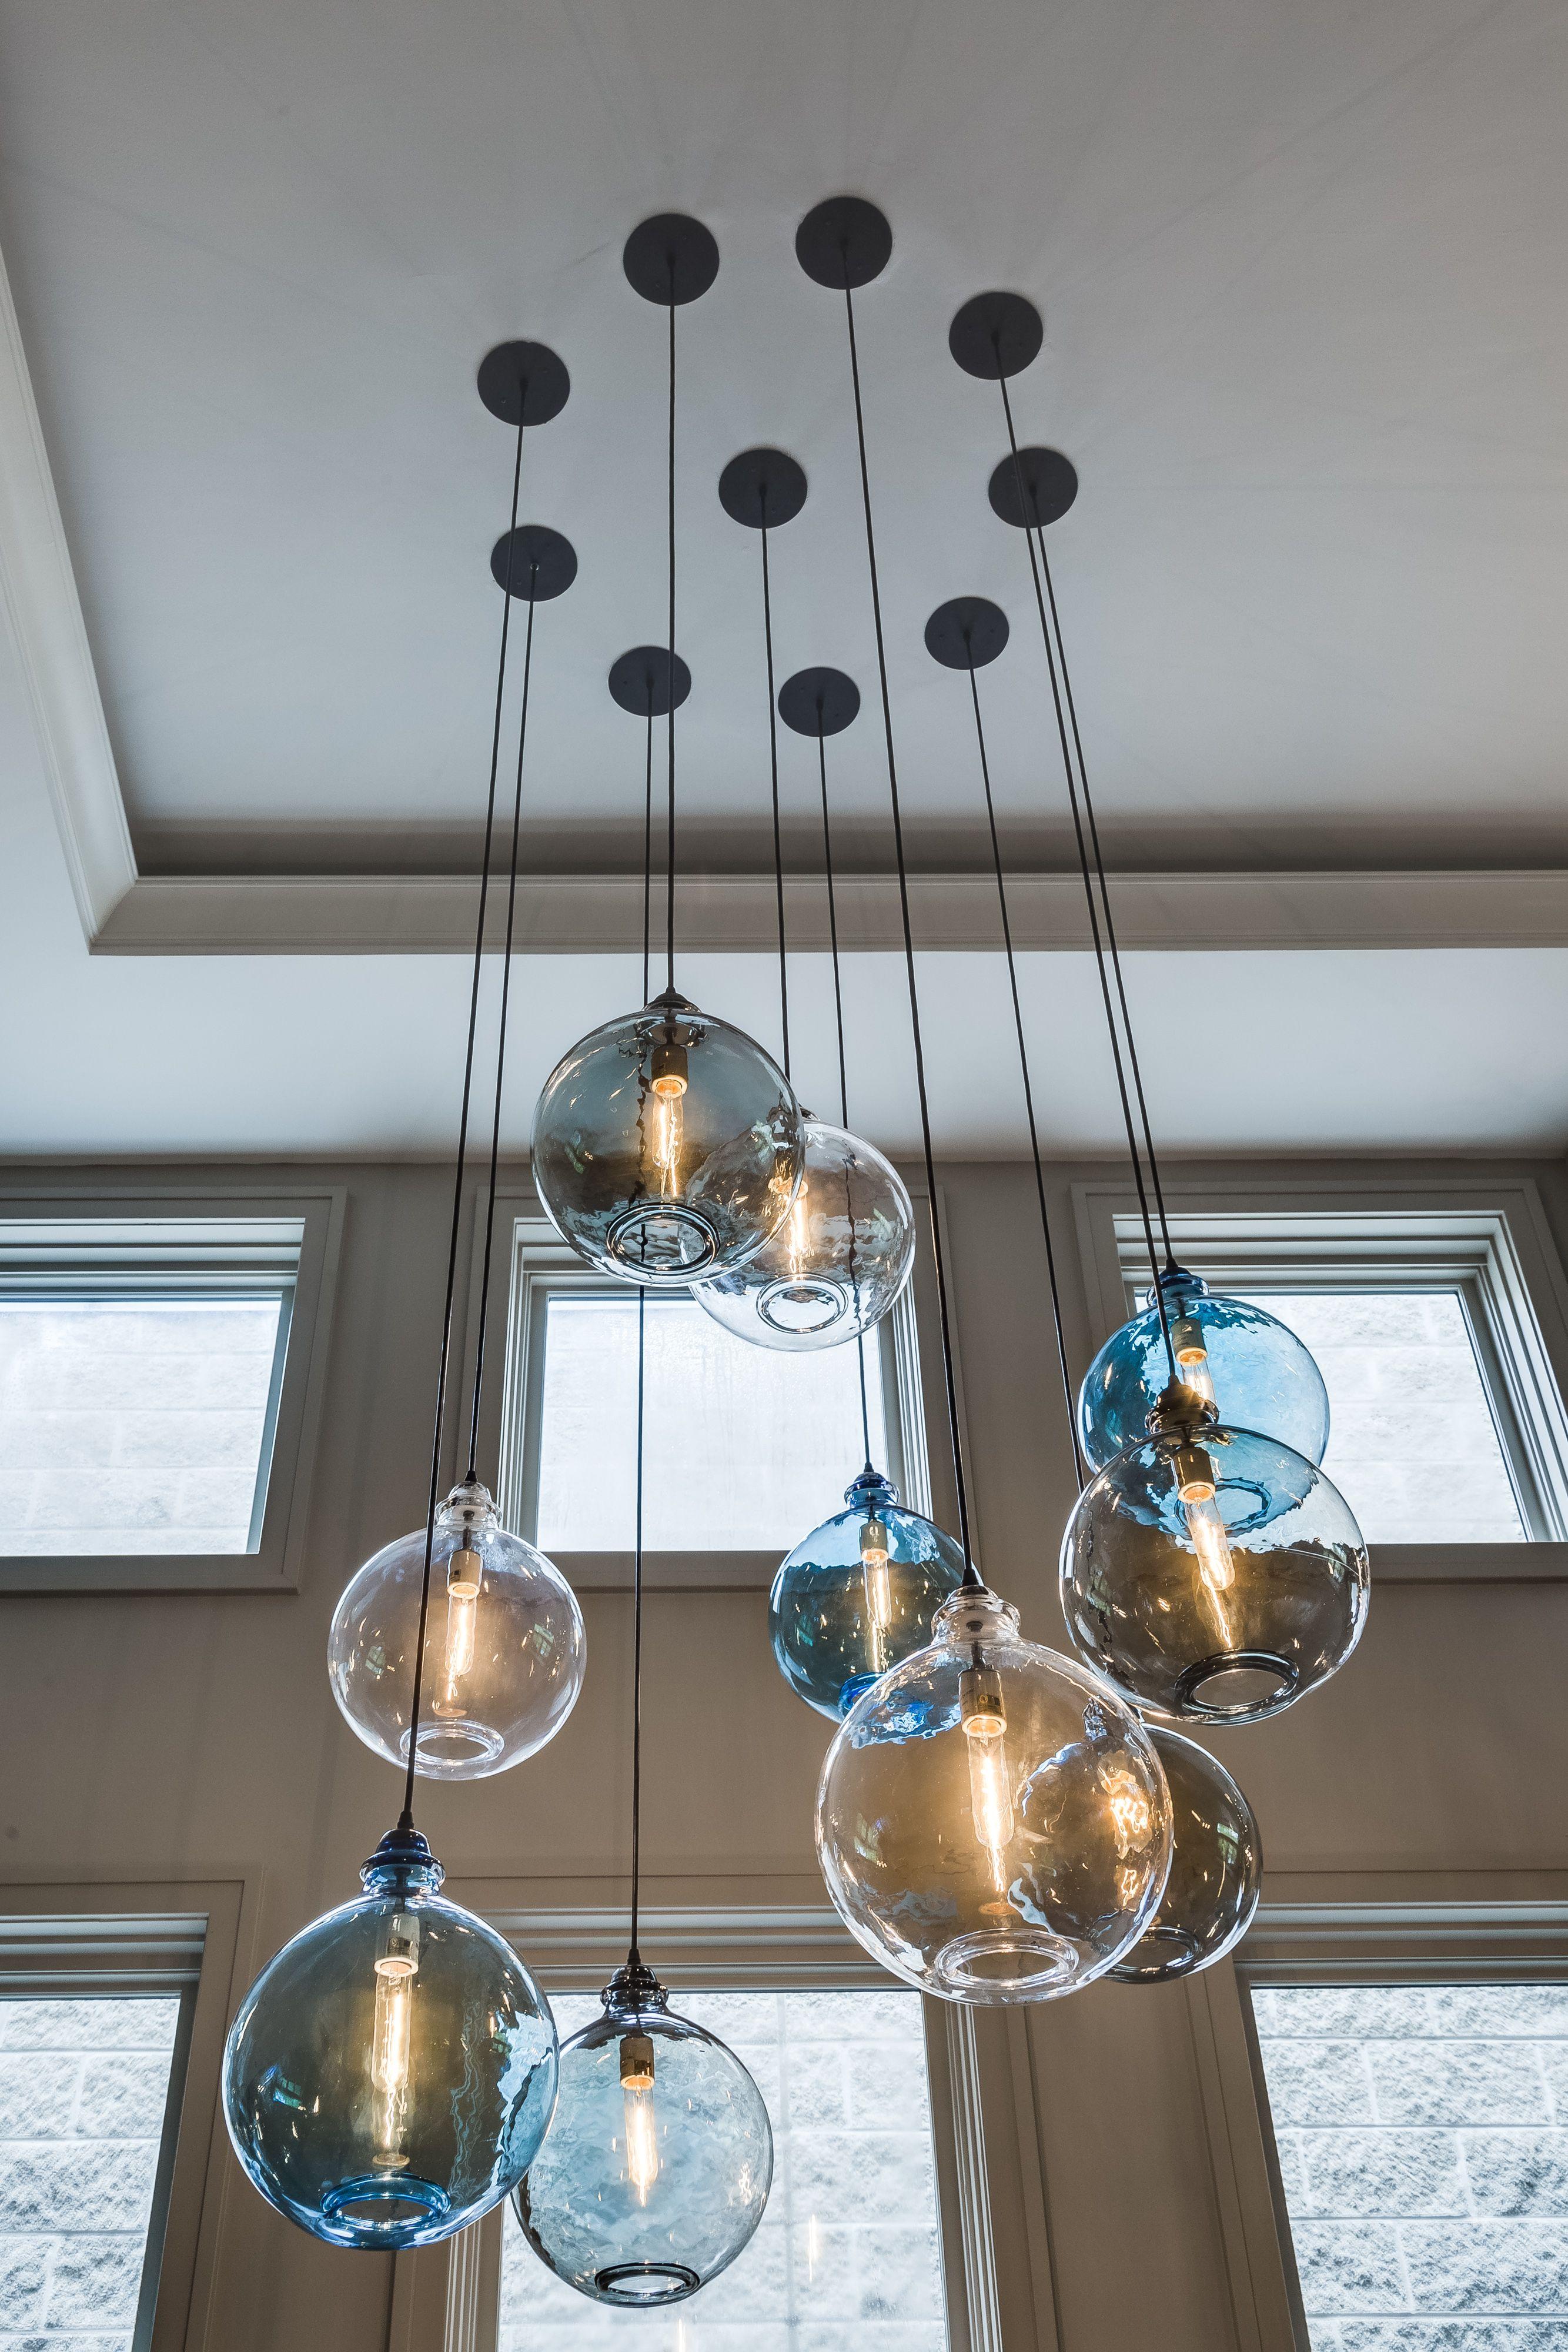 Salon-spiegel-designs urban parlor living room with globe lighting multi light pendant